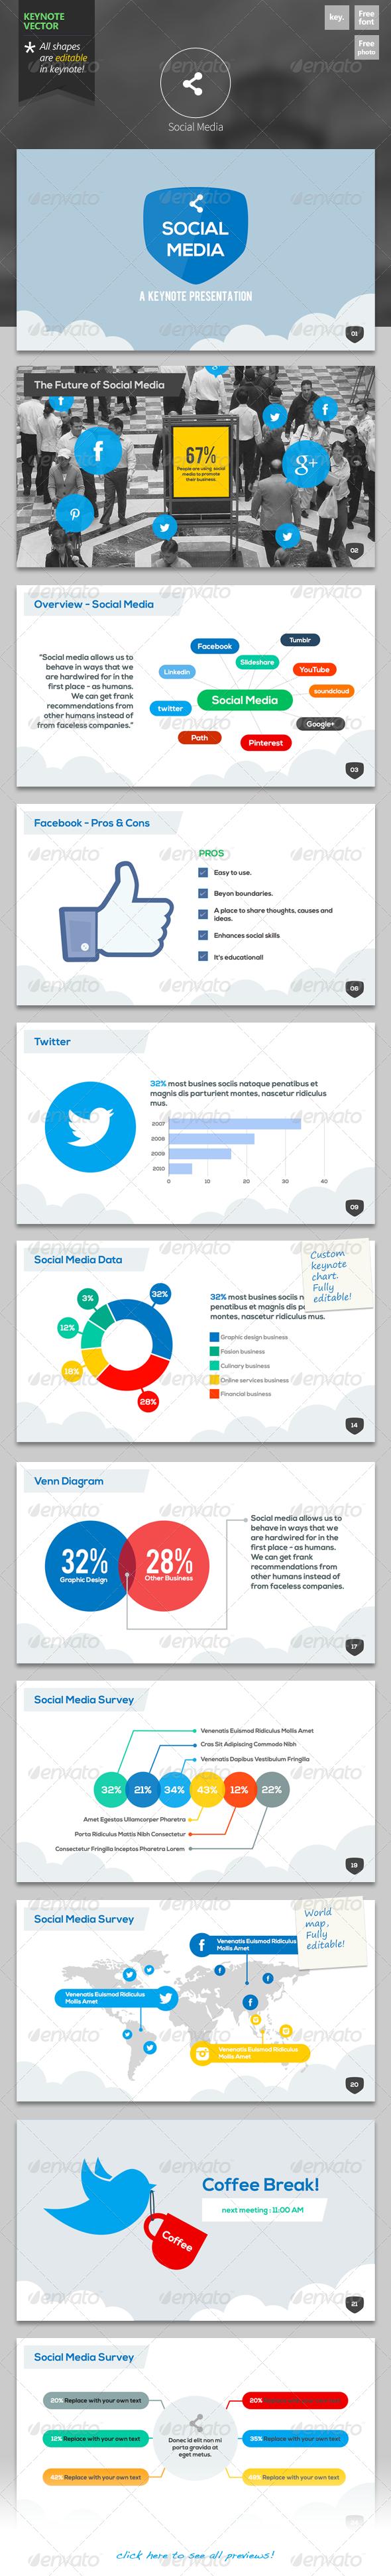 Social Media - Keynote Template - Keynote Templates Presentation Templates